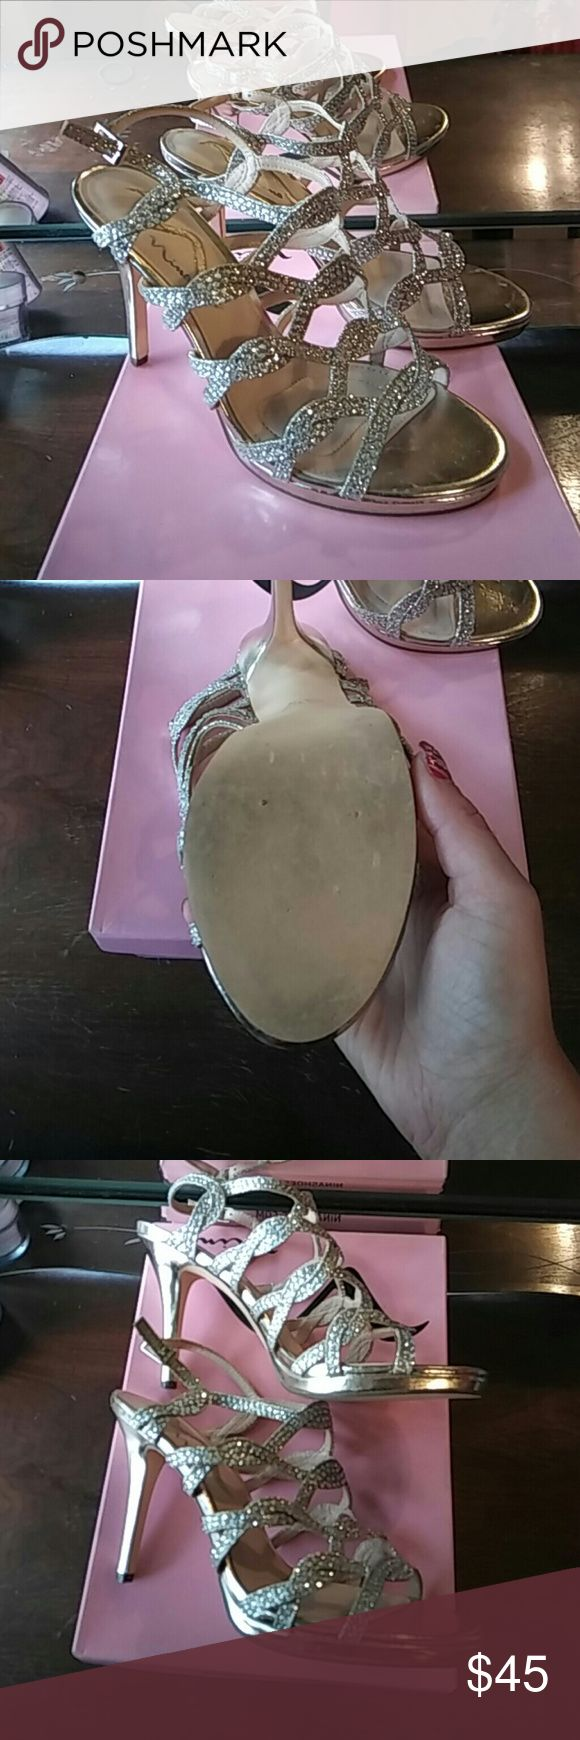 Rhinestone heels Gold with silver rhinestones Shoes Heels